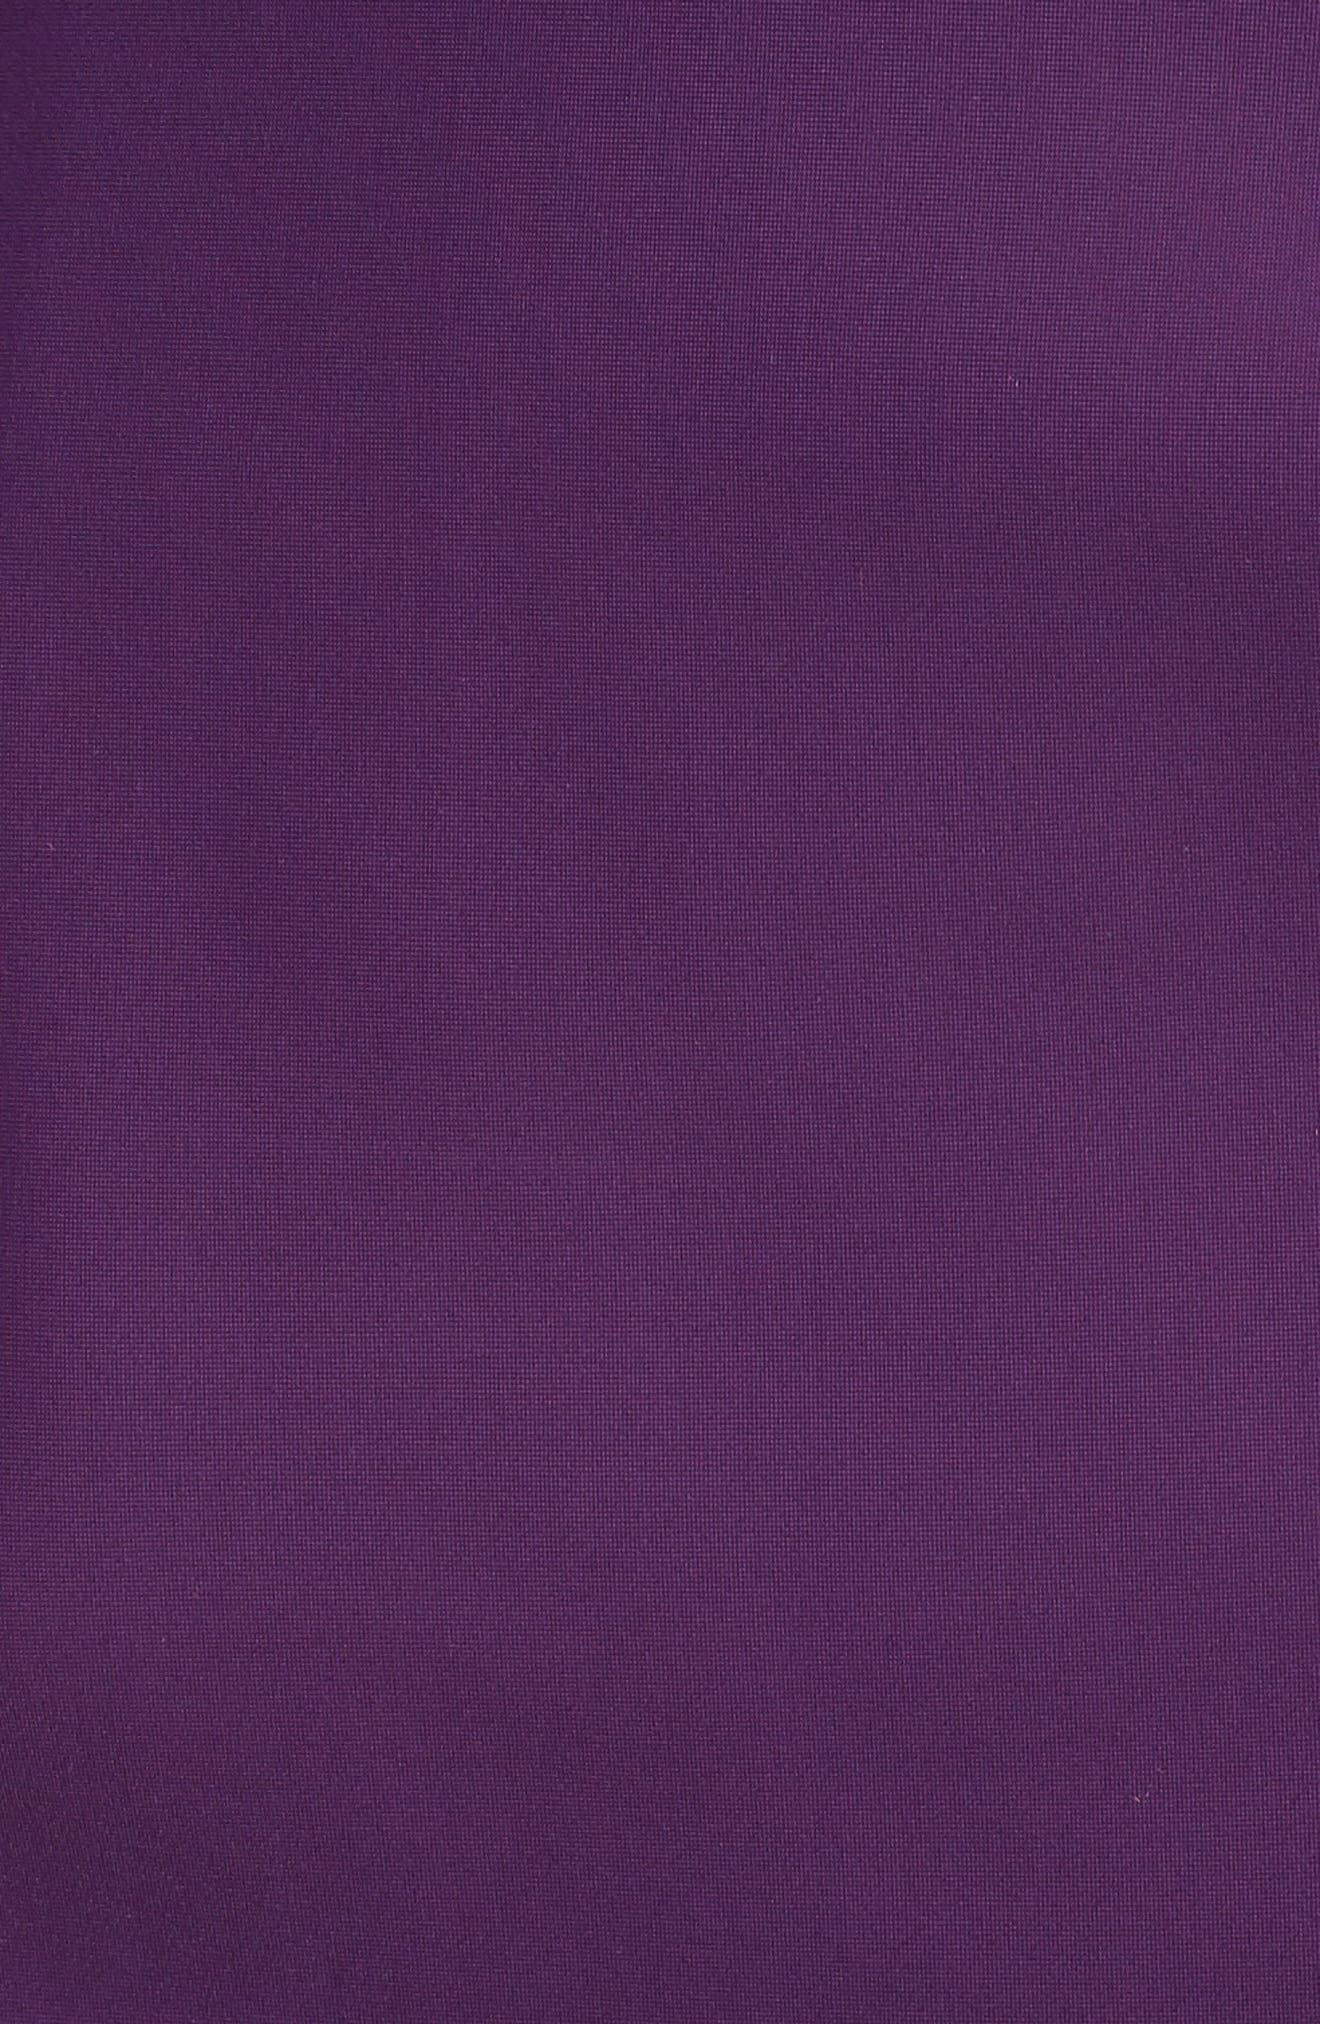 Embellished Surplice Sheath Dress,                             Alternate thumbnail 34, color,